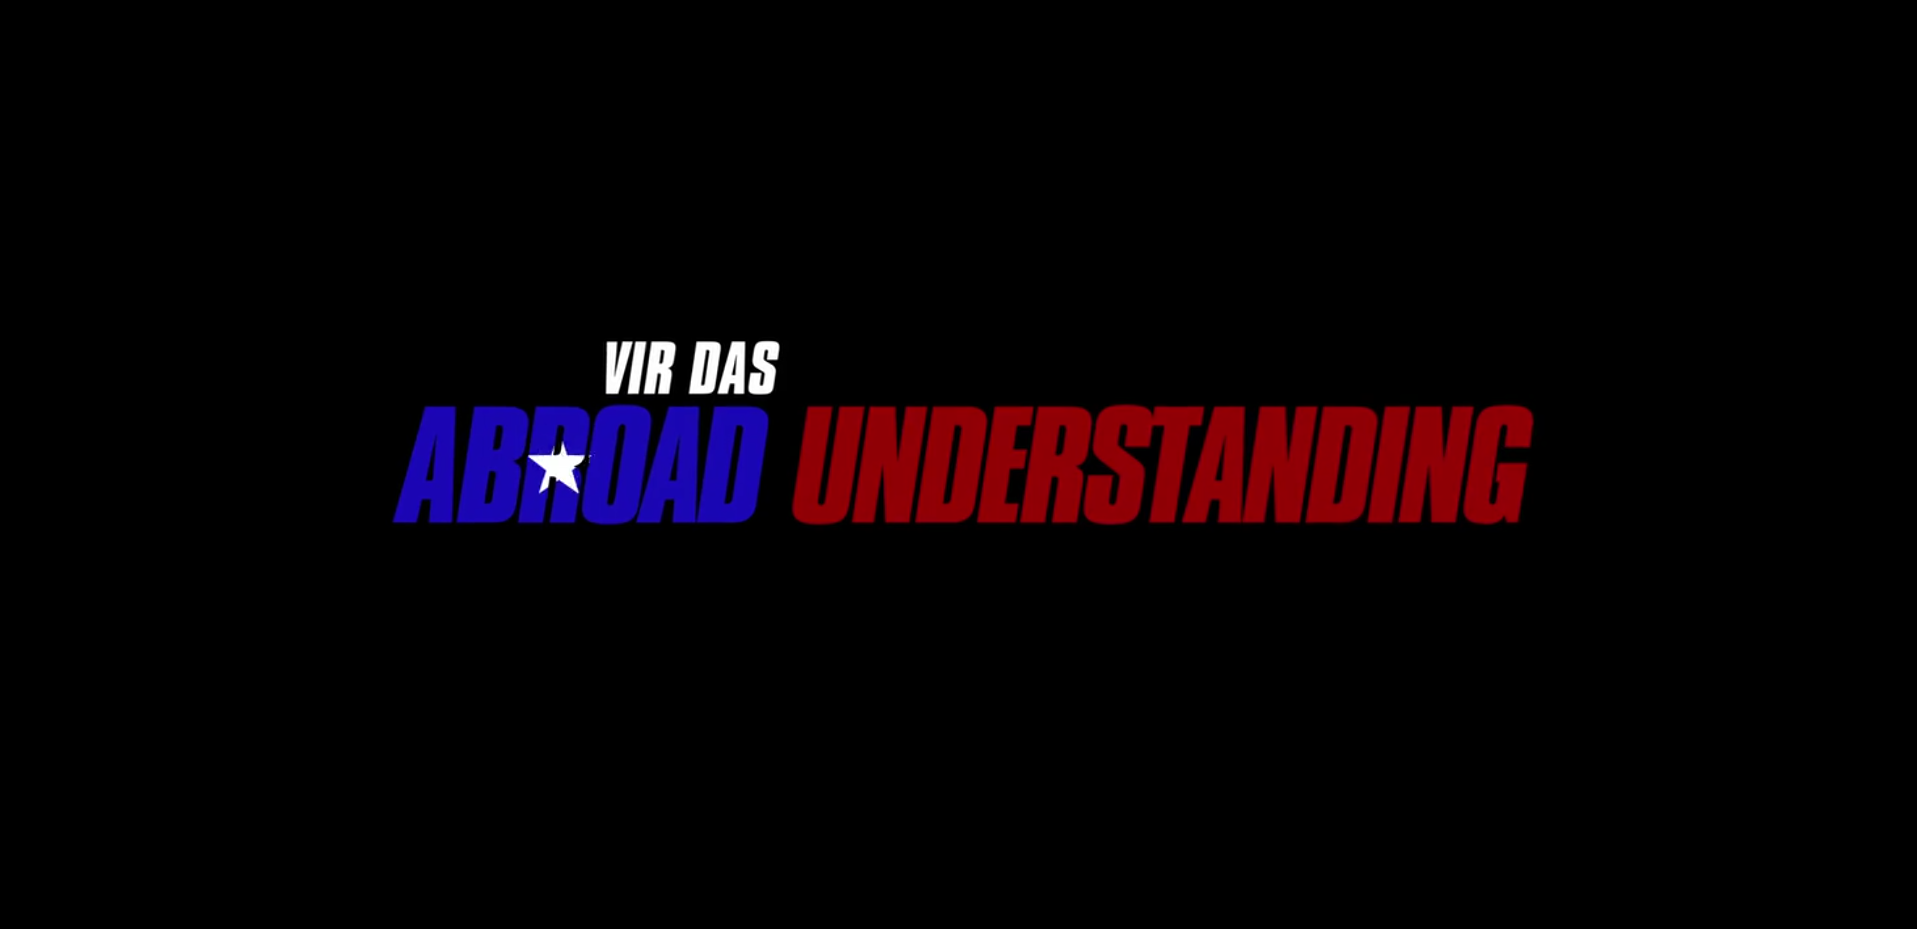 vir das abroad understanding review